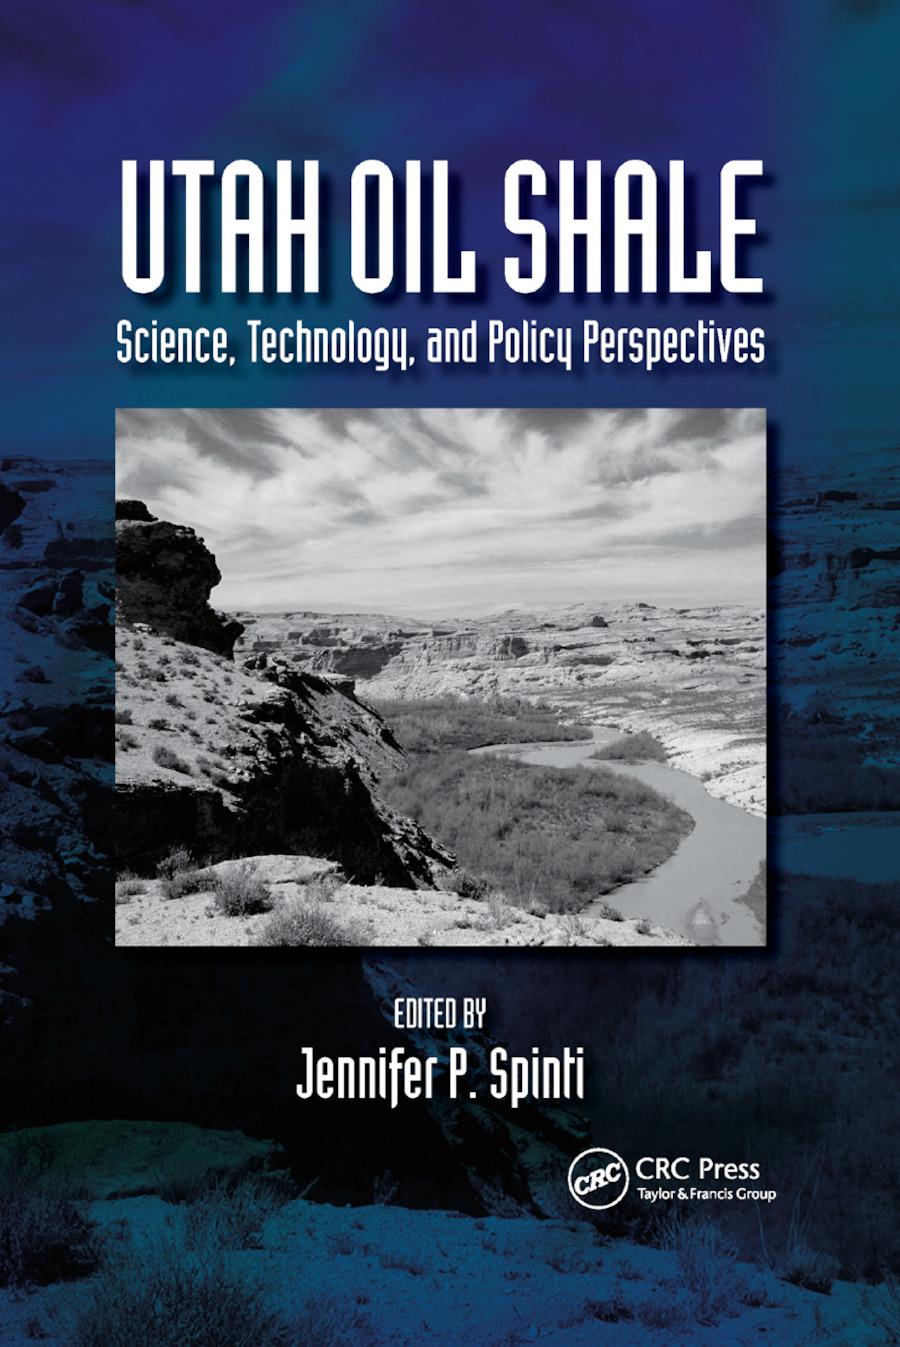 Utah Oil Shale